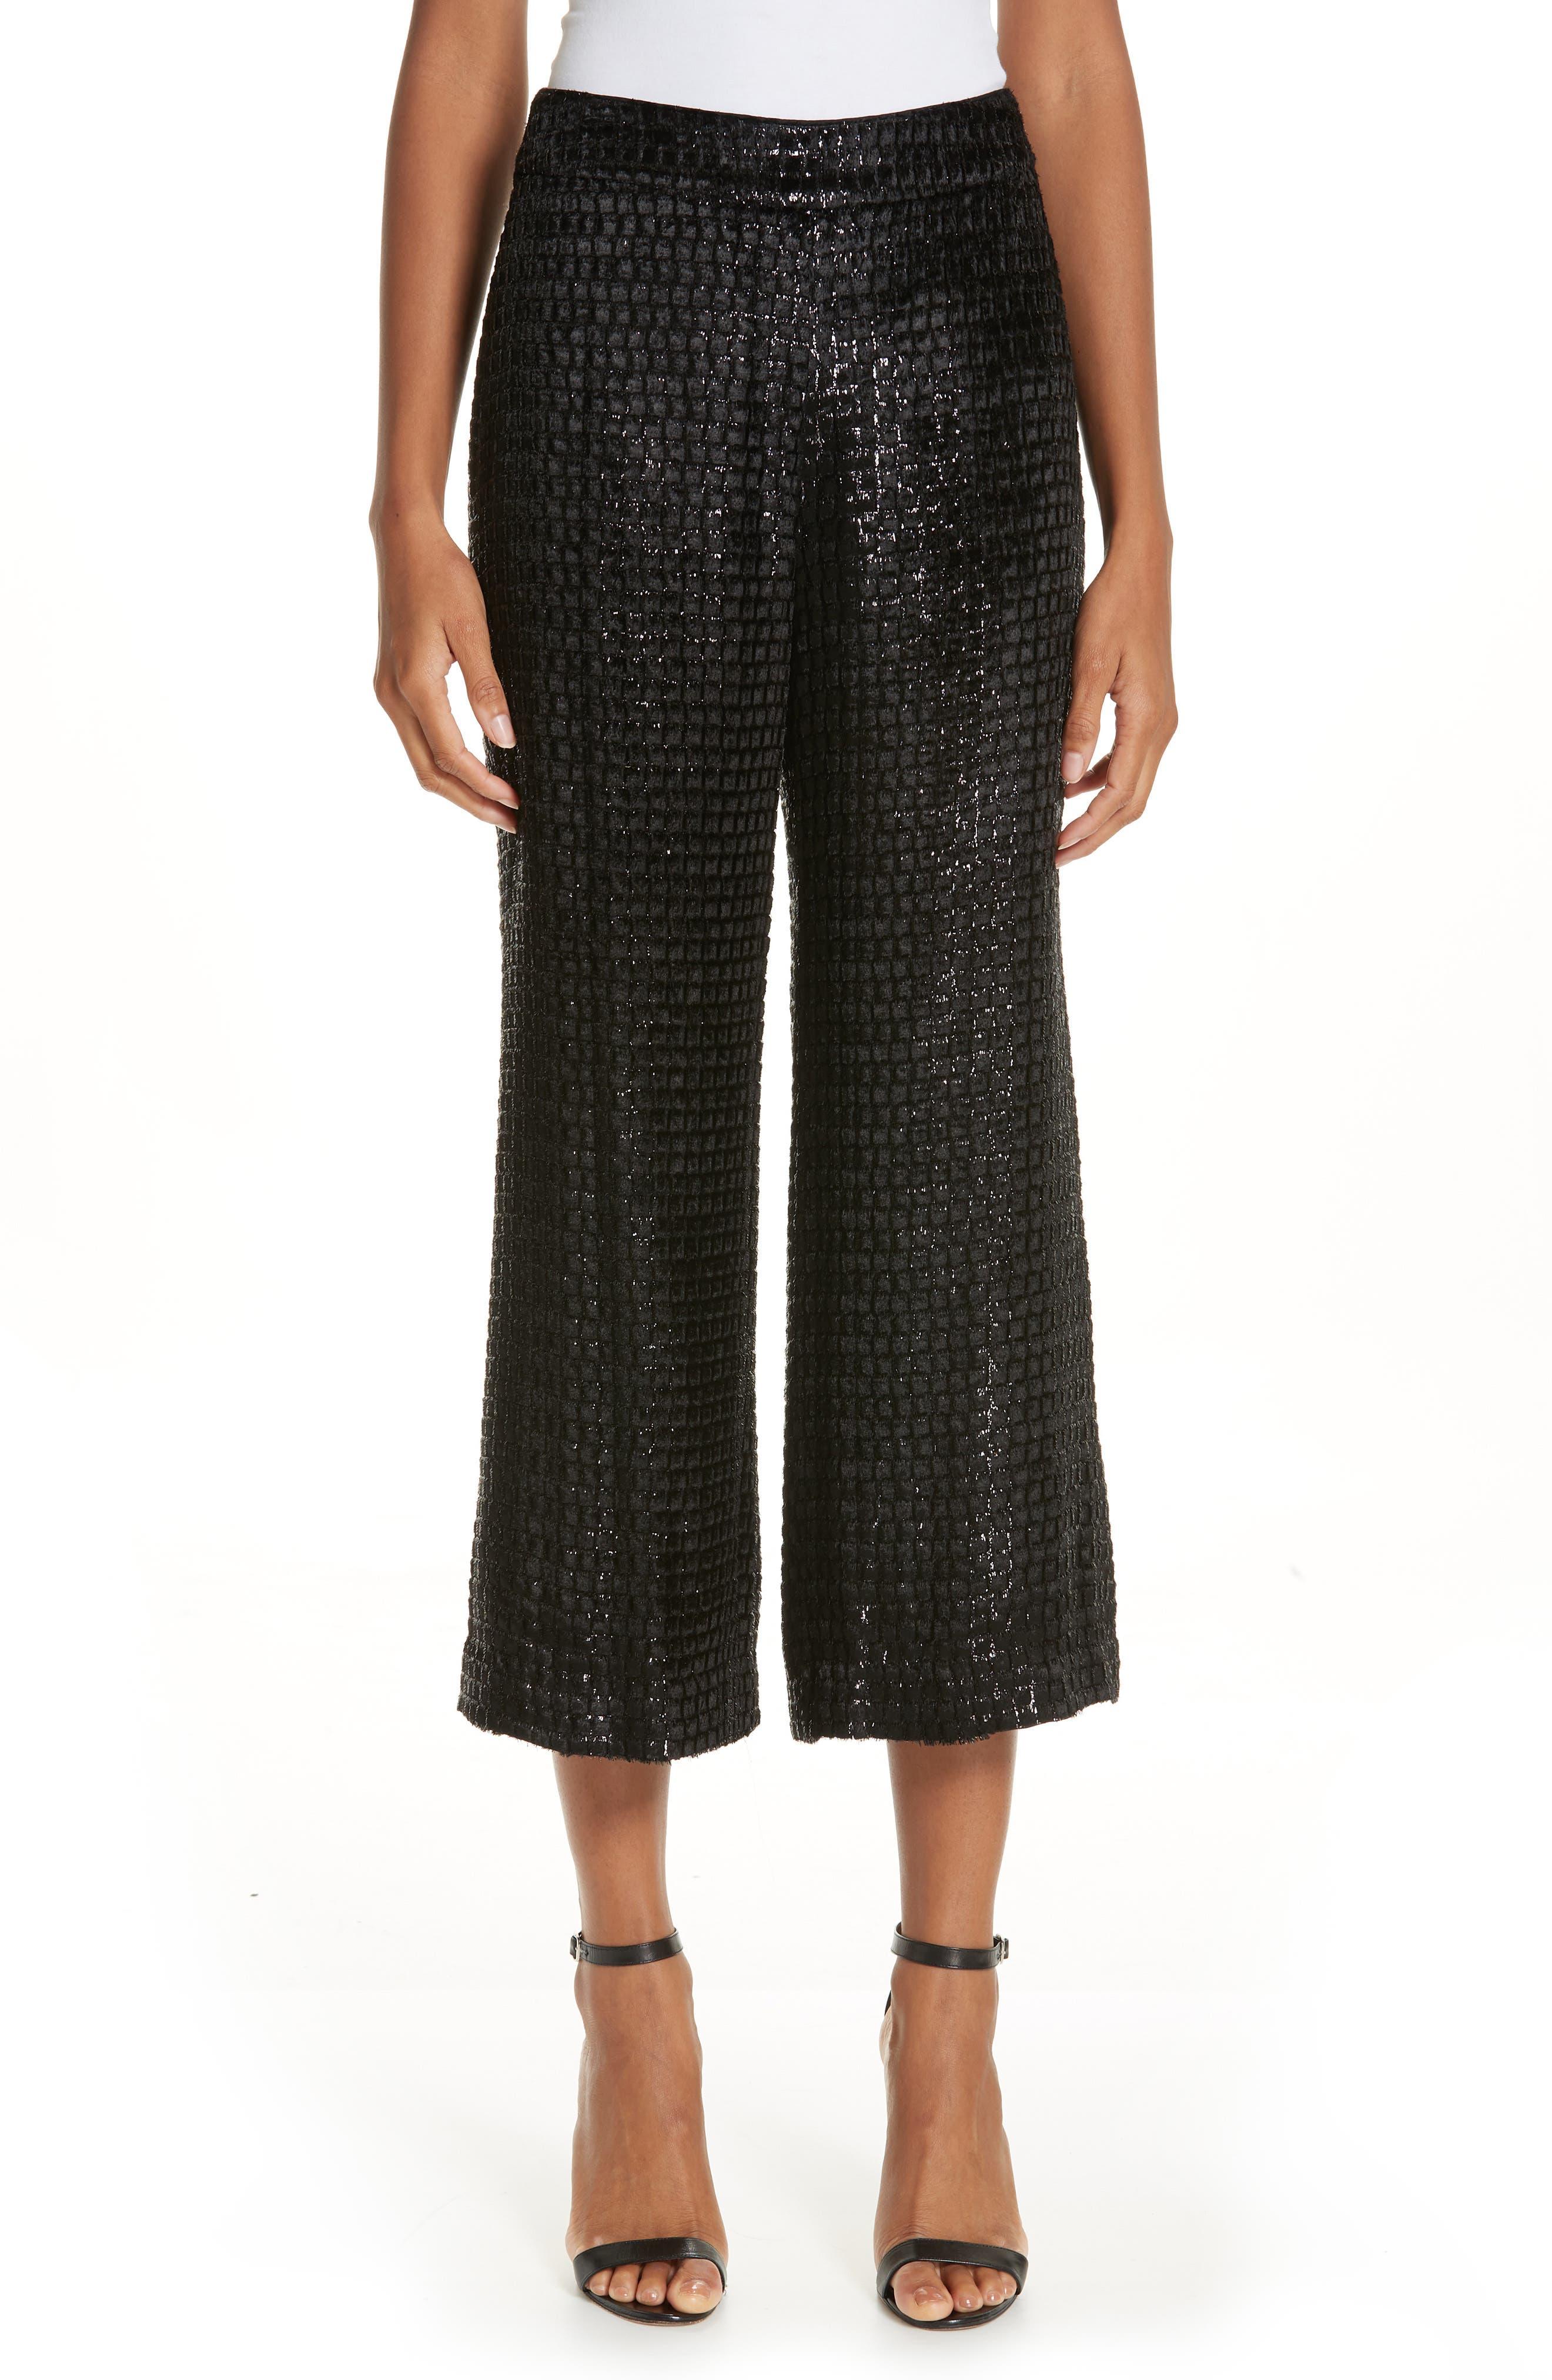 BRANDON MAXWELL Metallic Velvet Crop Wide Leg Pants, Main, color, BLACK